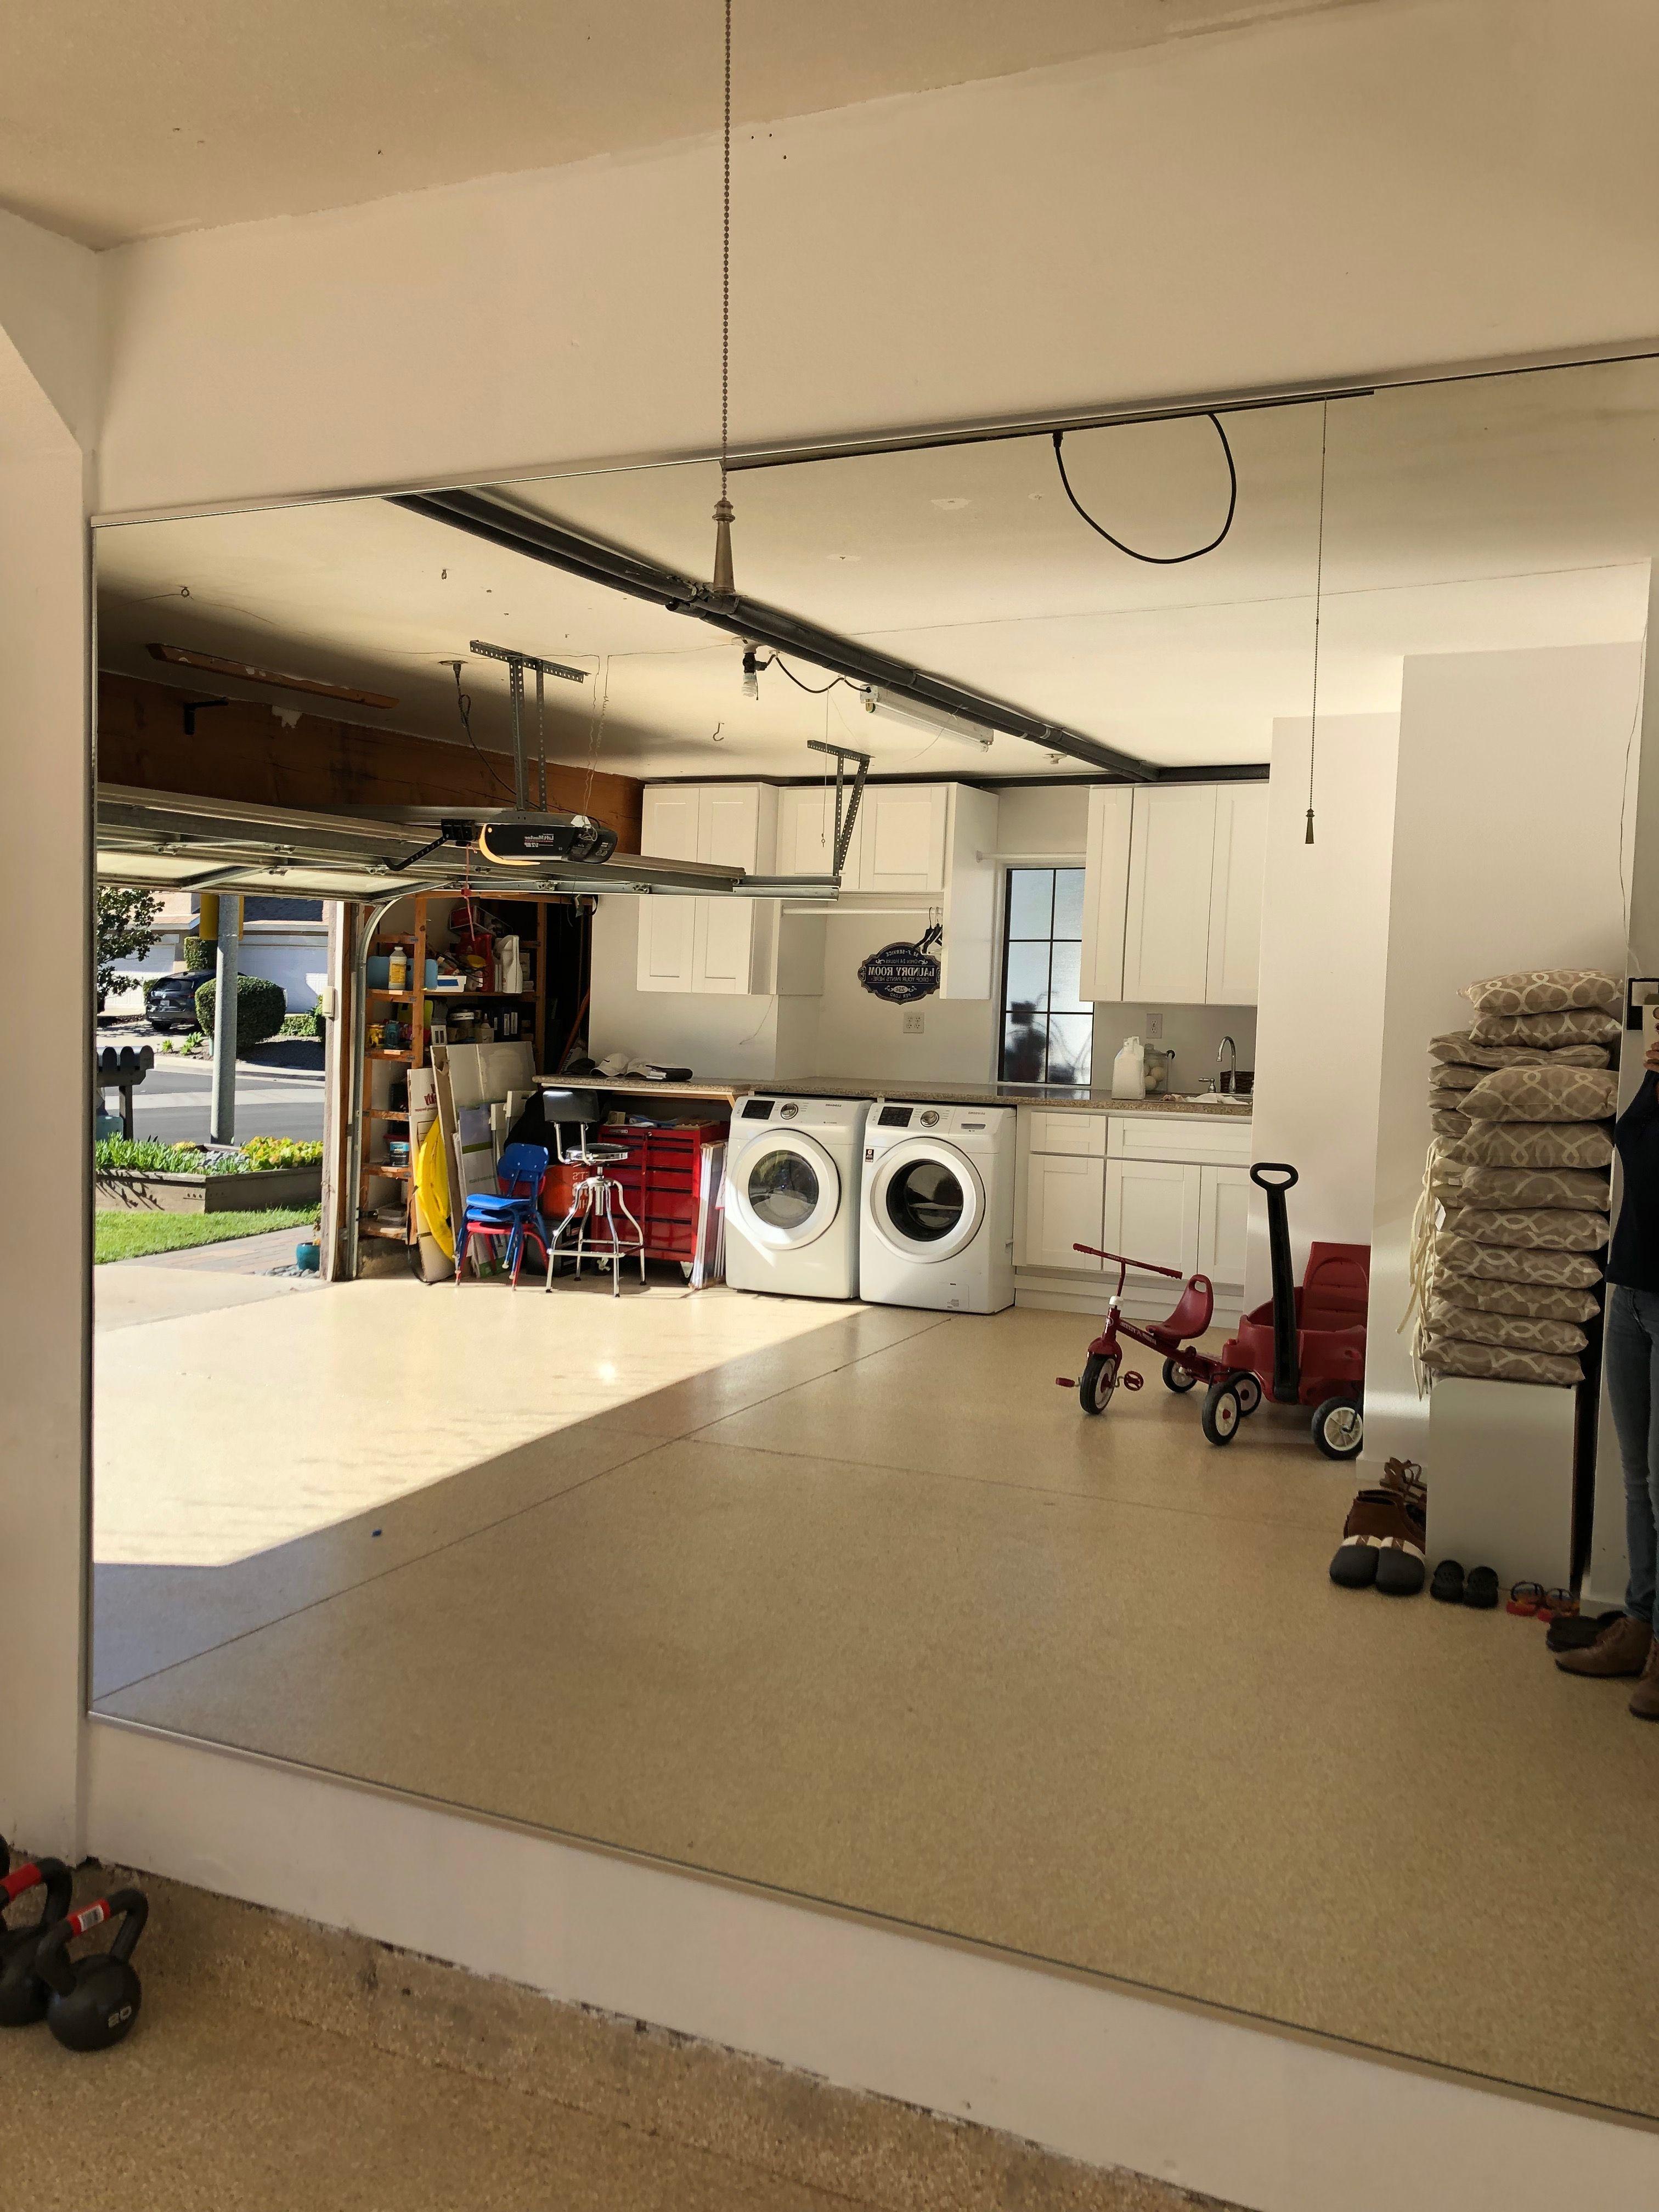 Garage gym mirror 6x8 mirror by affordable mirrors